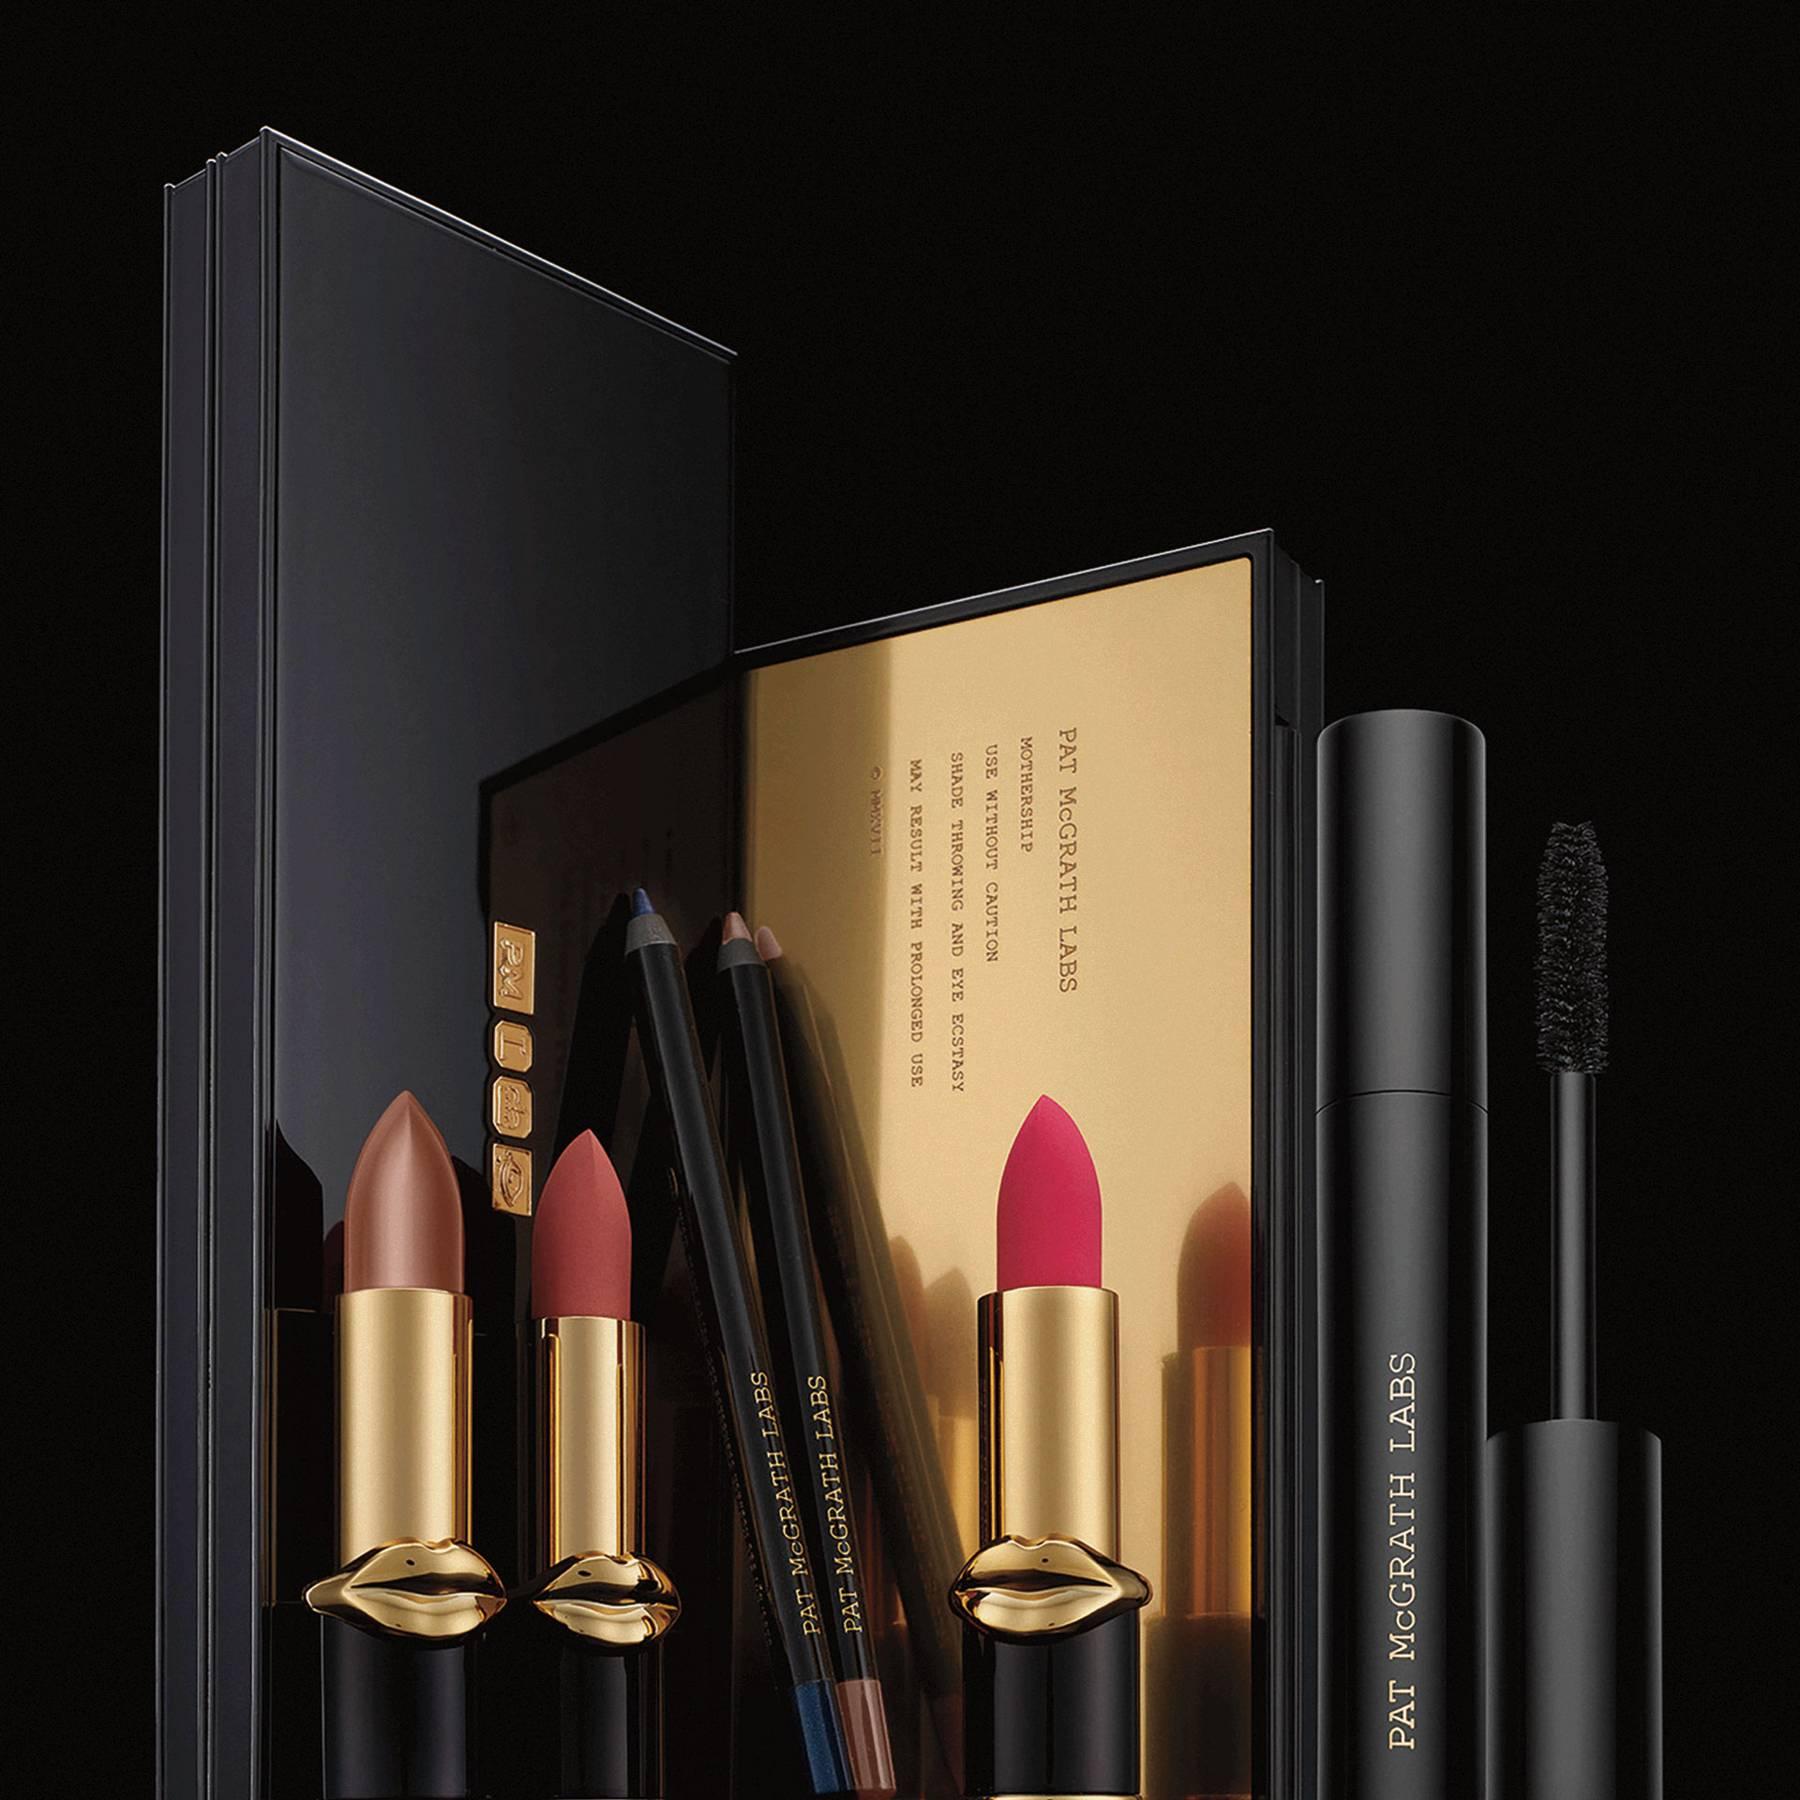 Pat McGrath Launches Permanent Makeup Collection forecasting